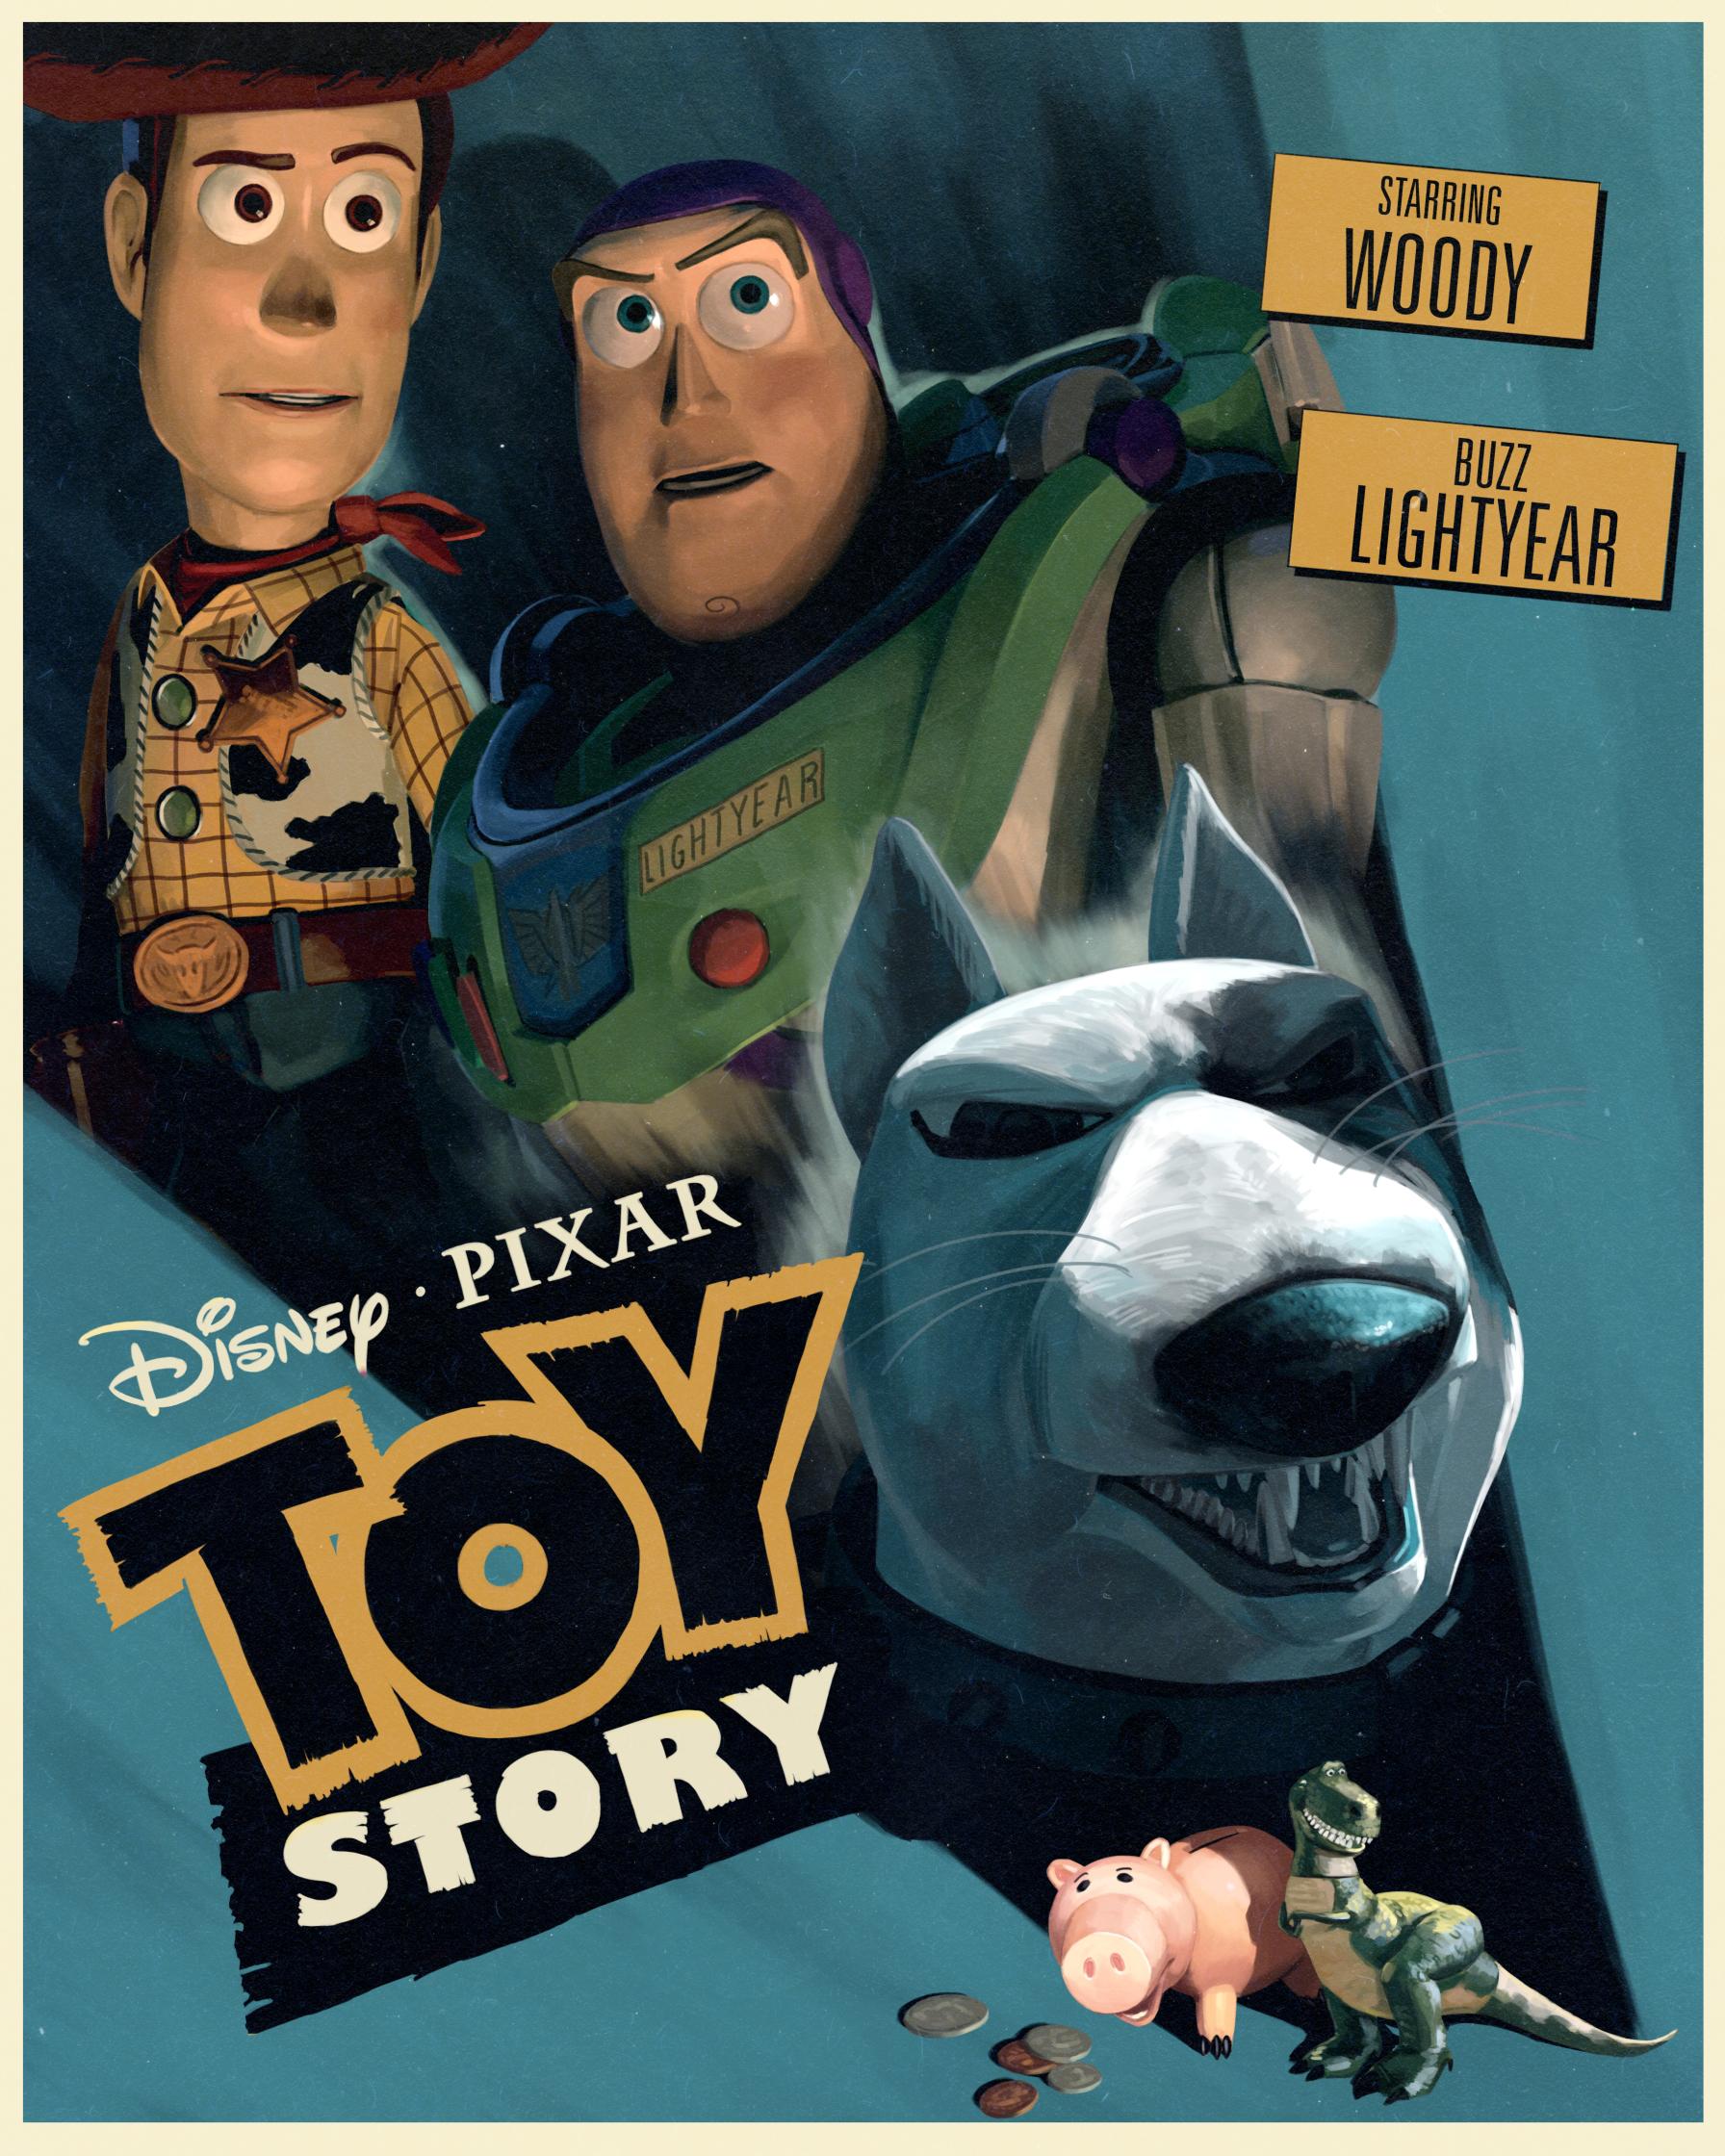 ToyStoryDarkFinal.jpg